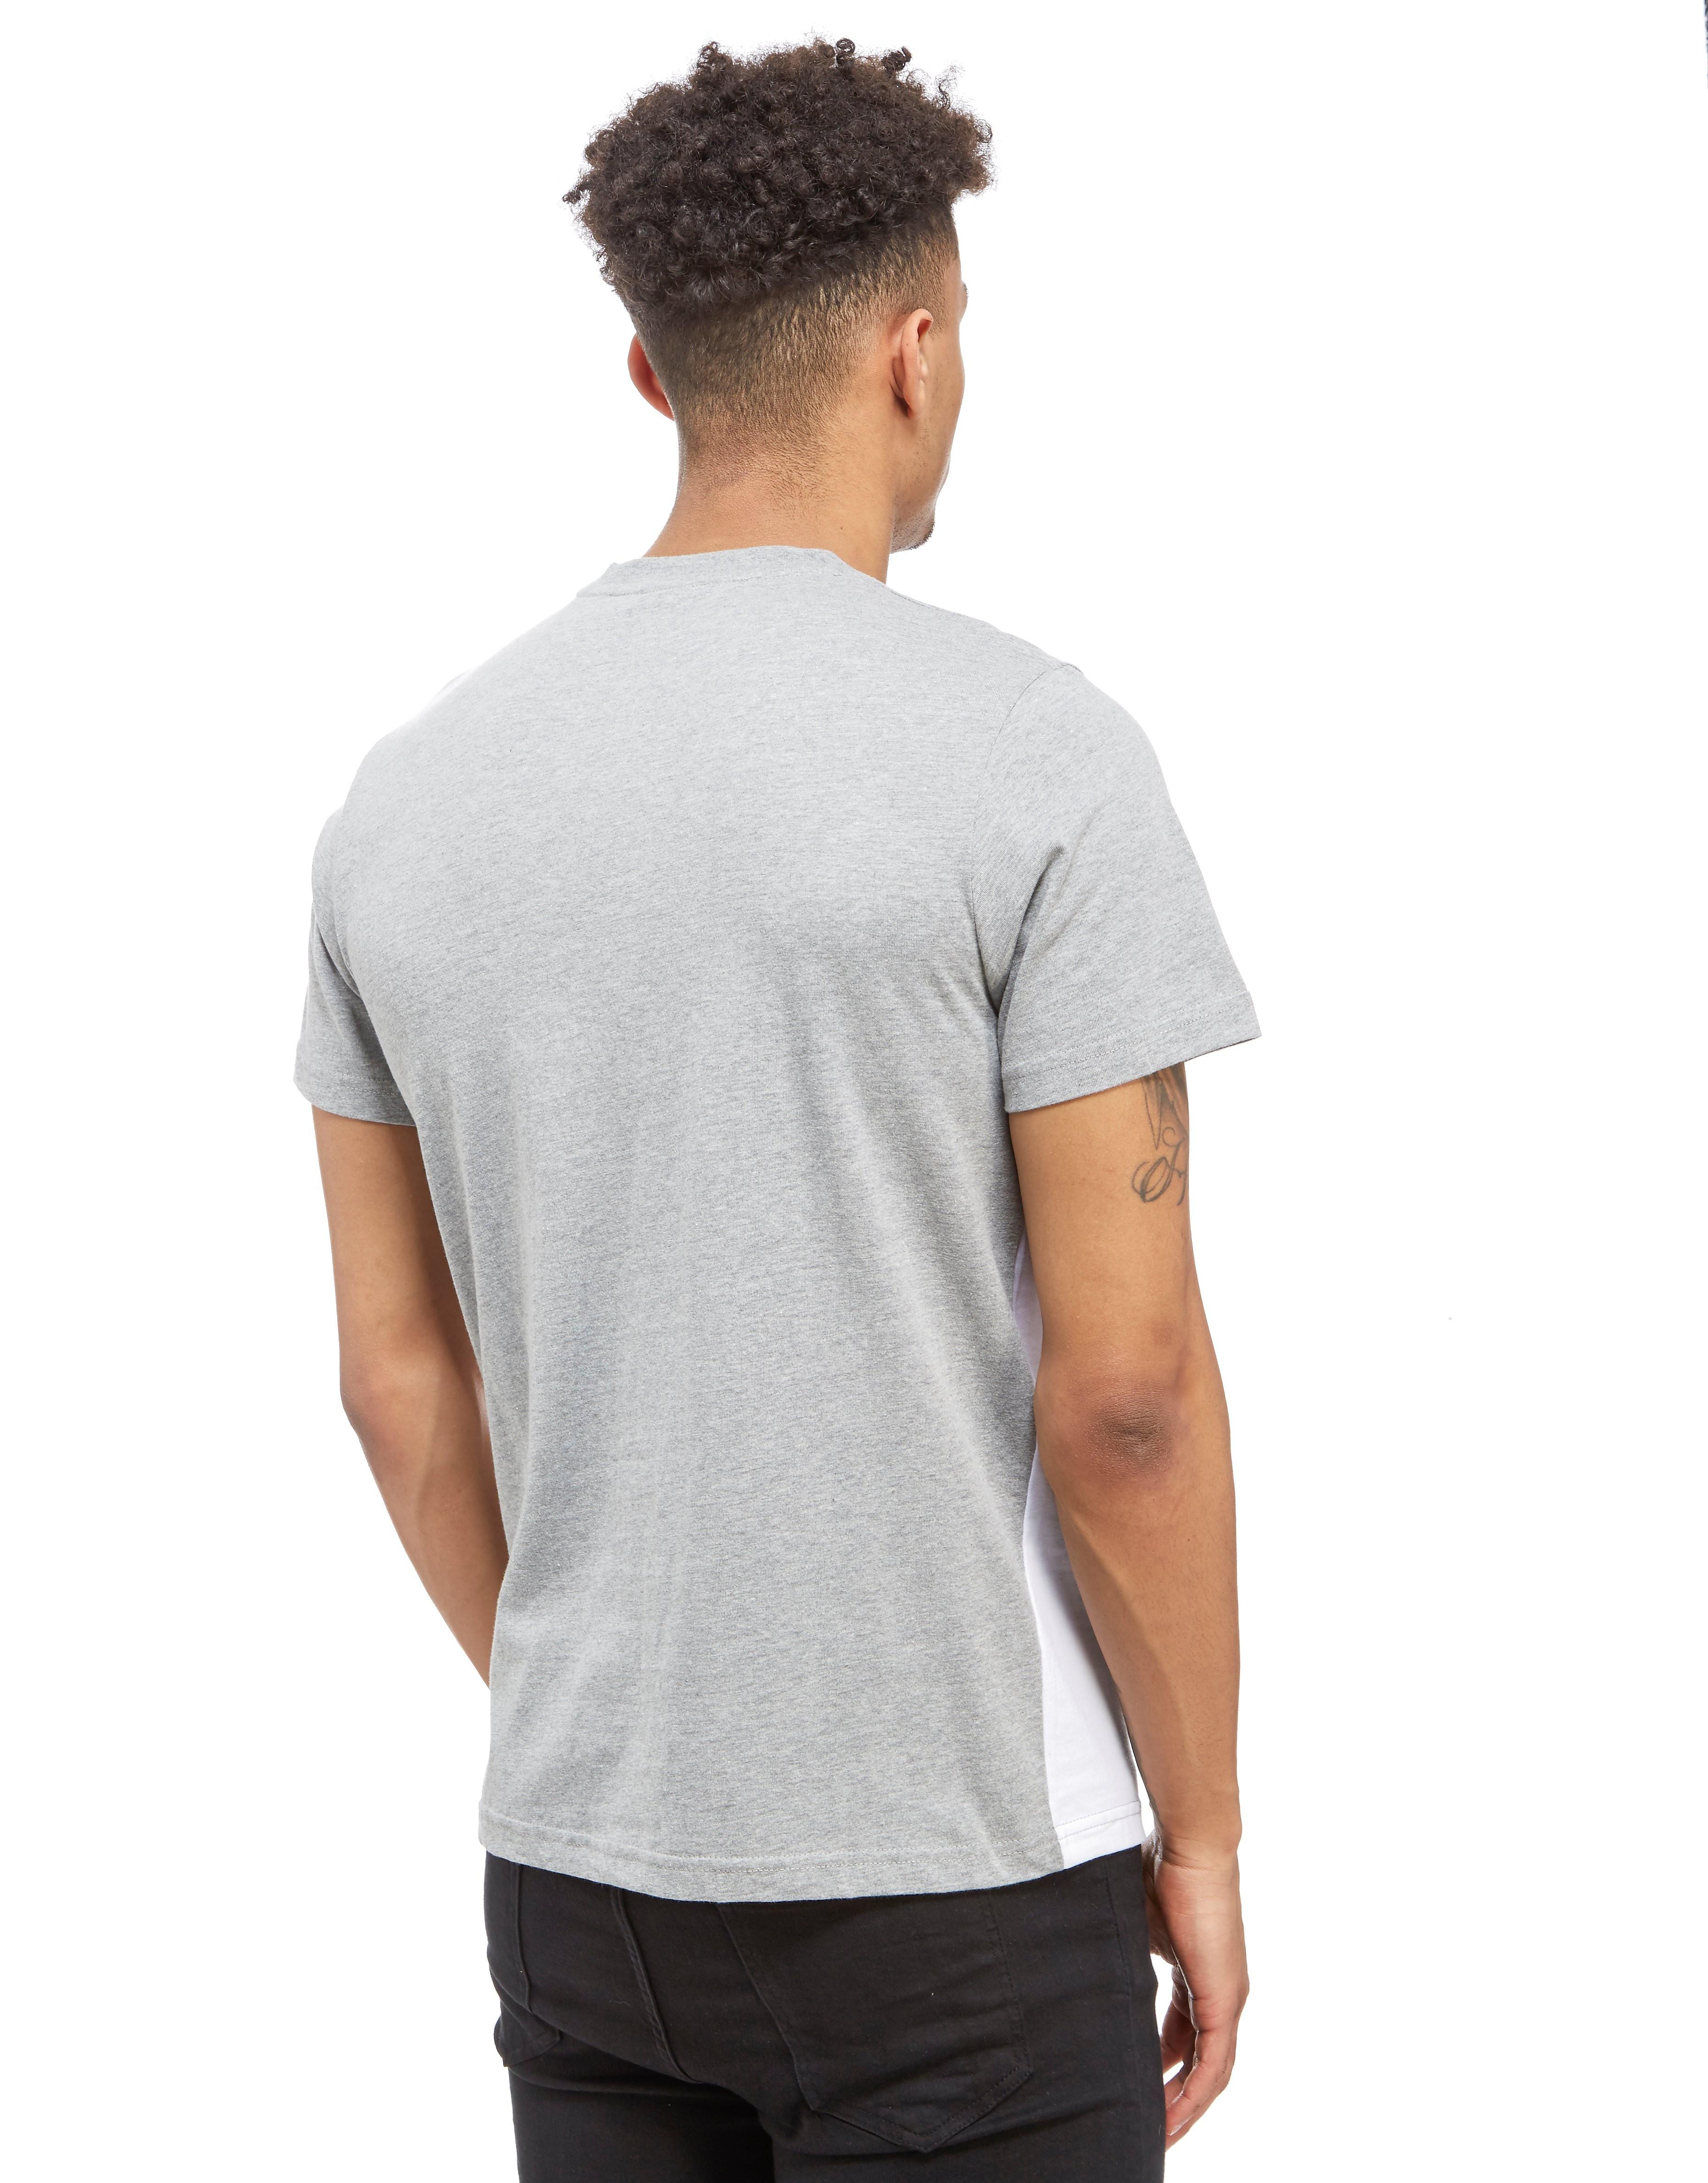 Fila T-shirt Agolana Homme